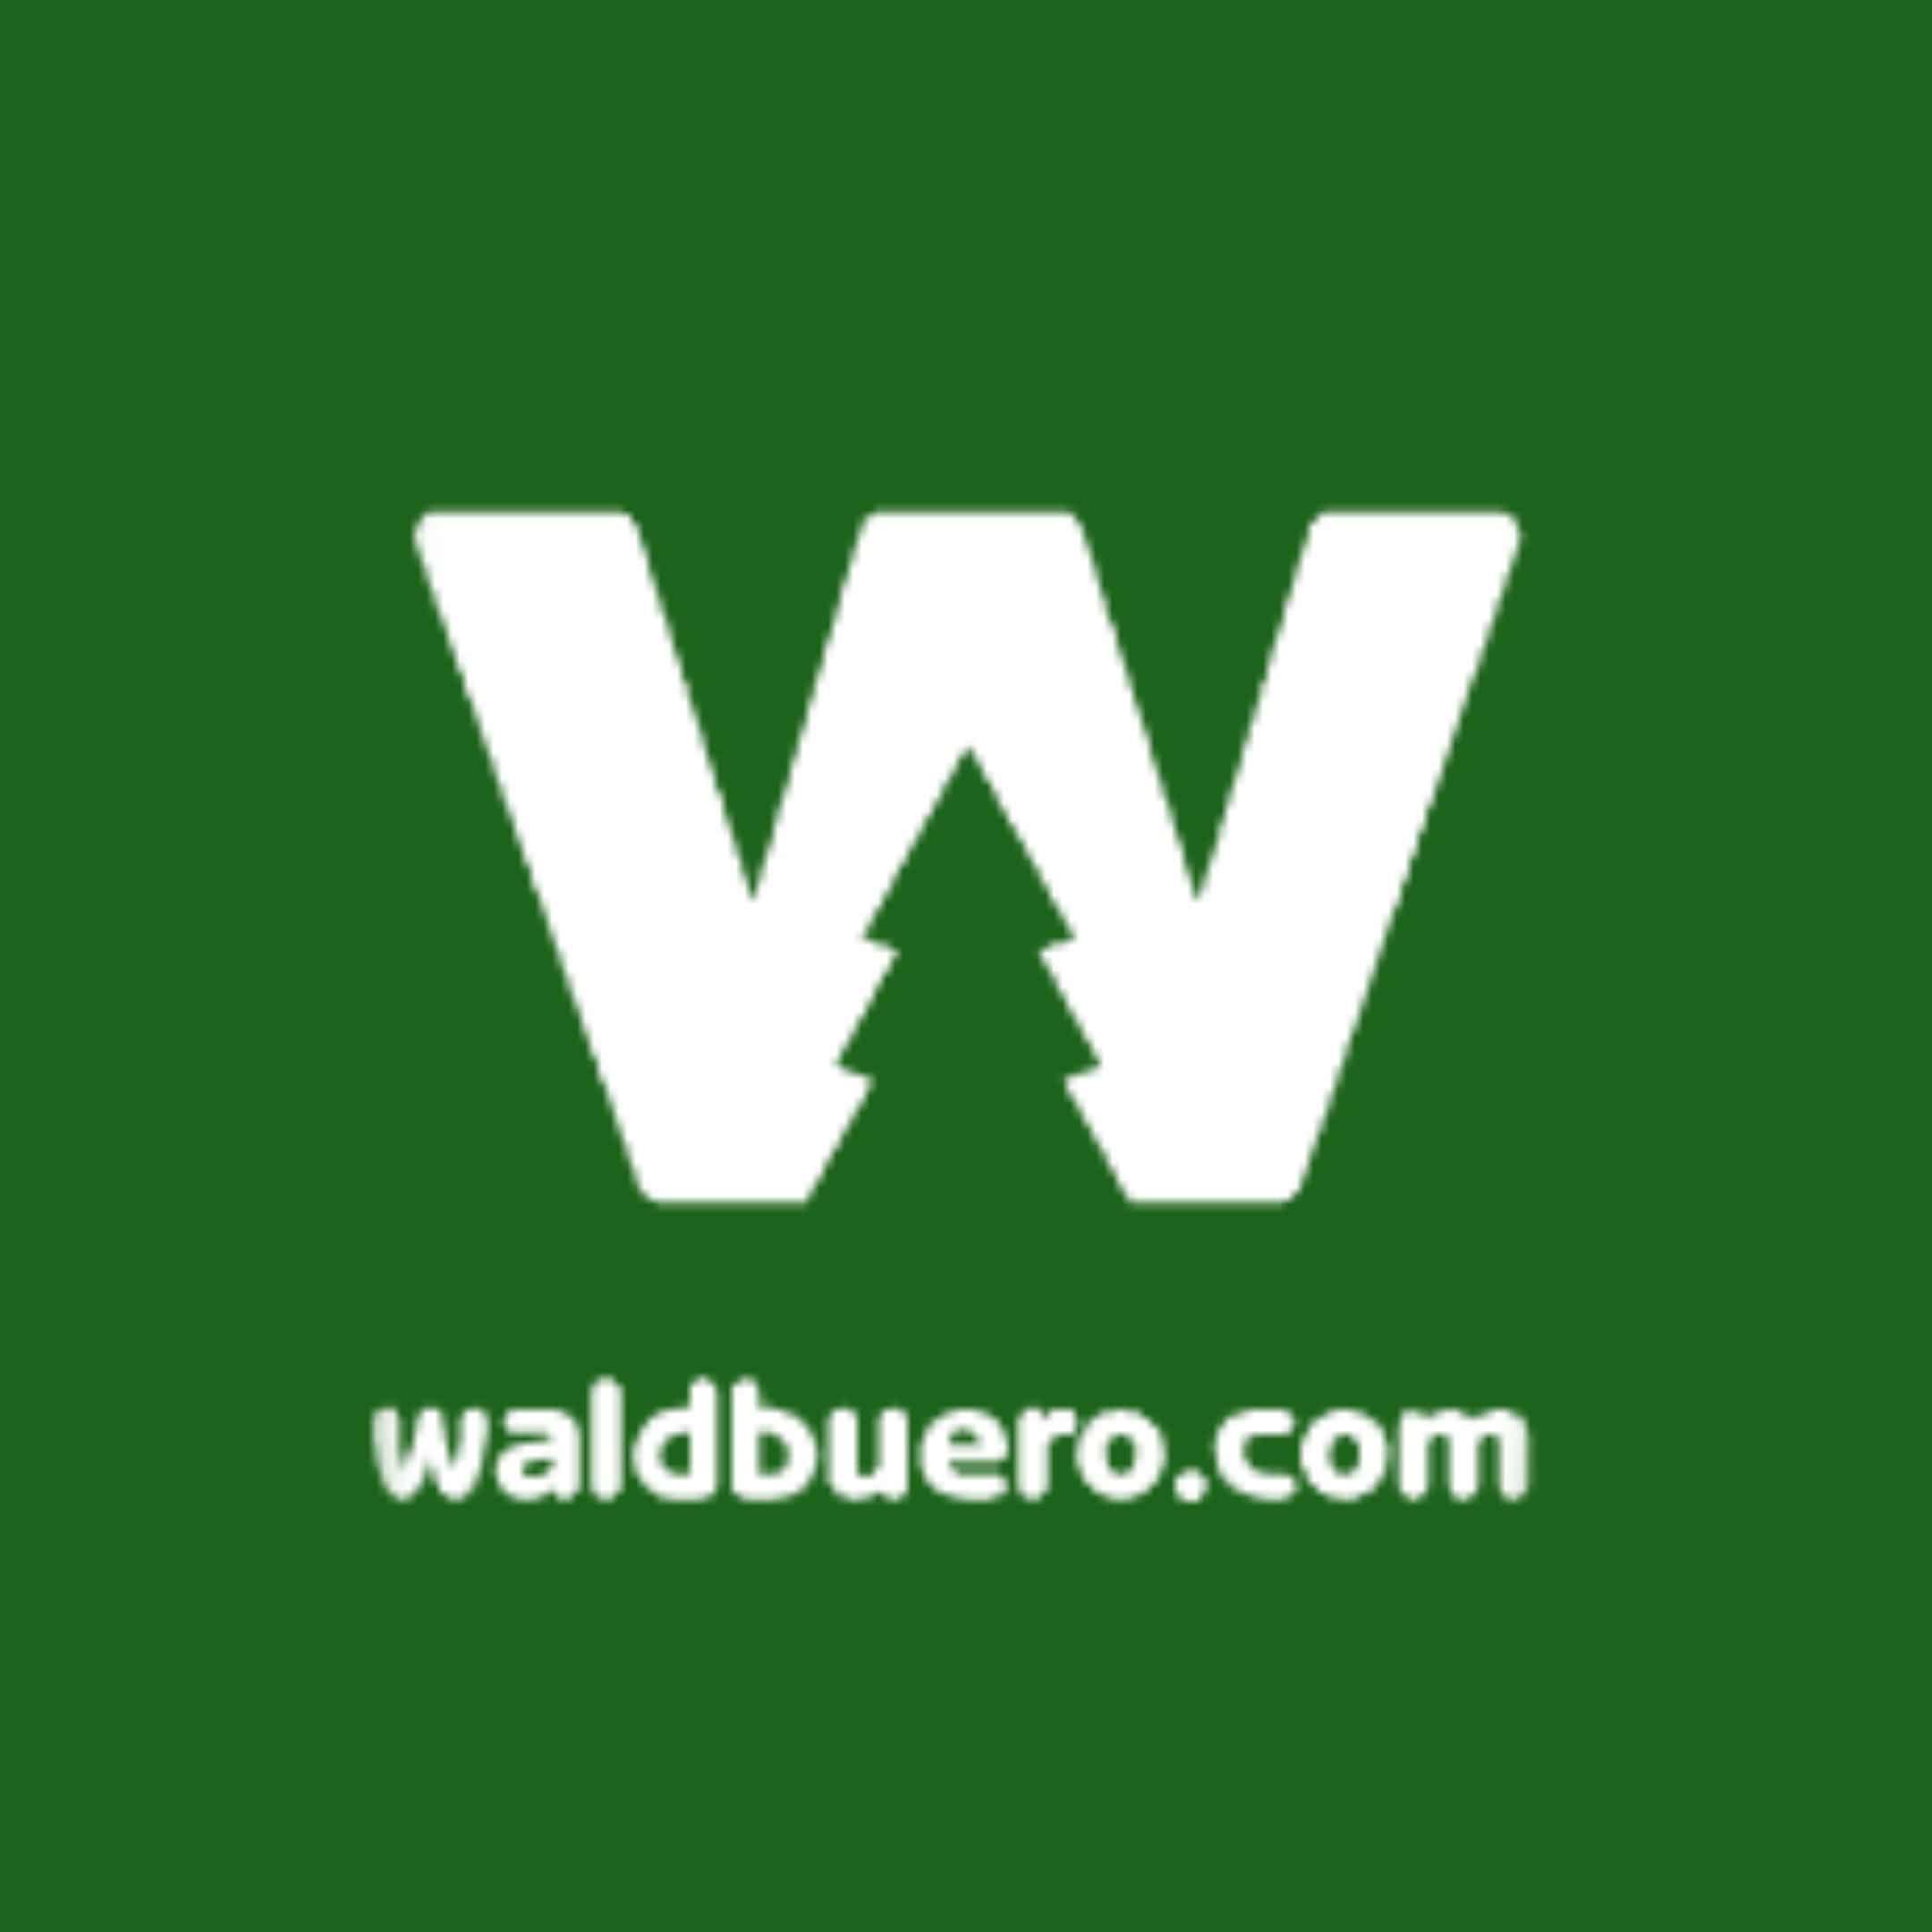 Waldbüro